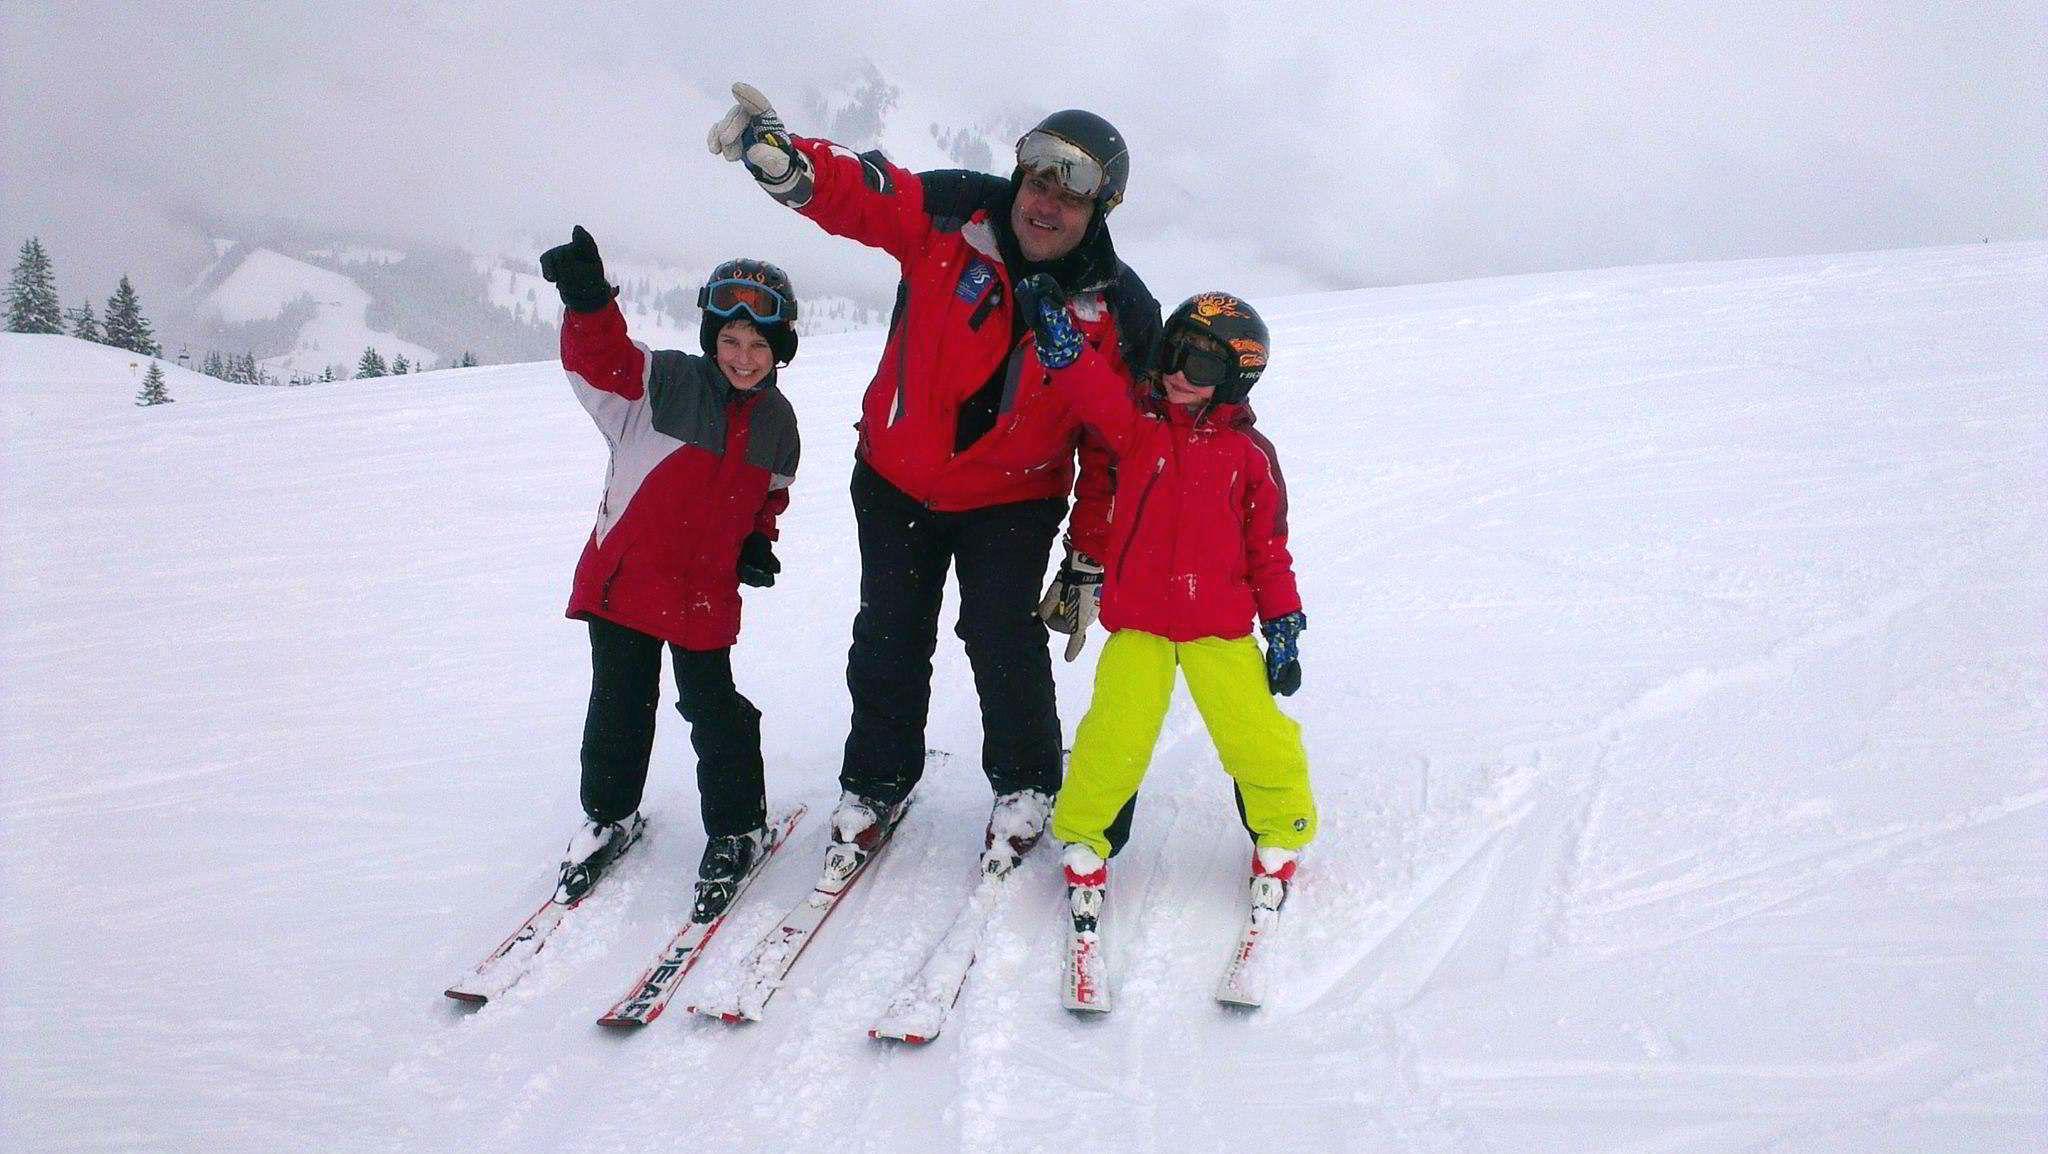 Ski Instructor Private for Kids - Advanced